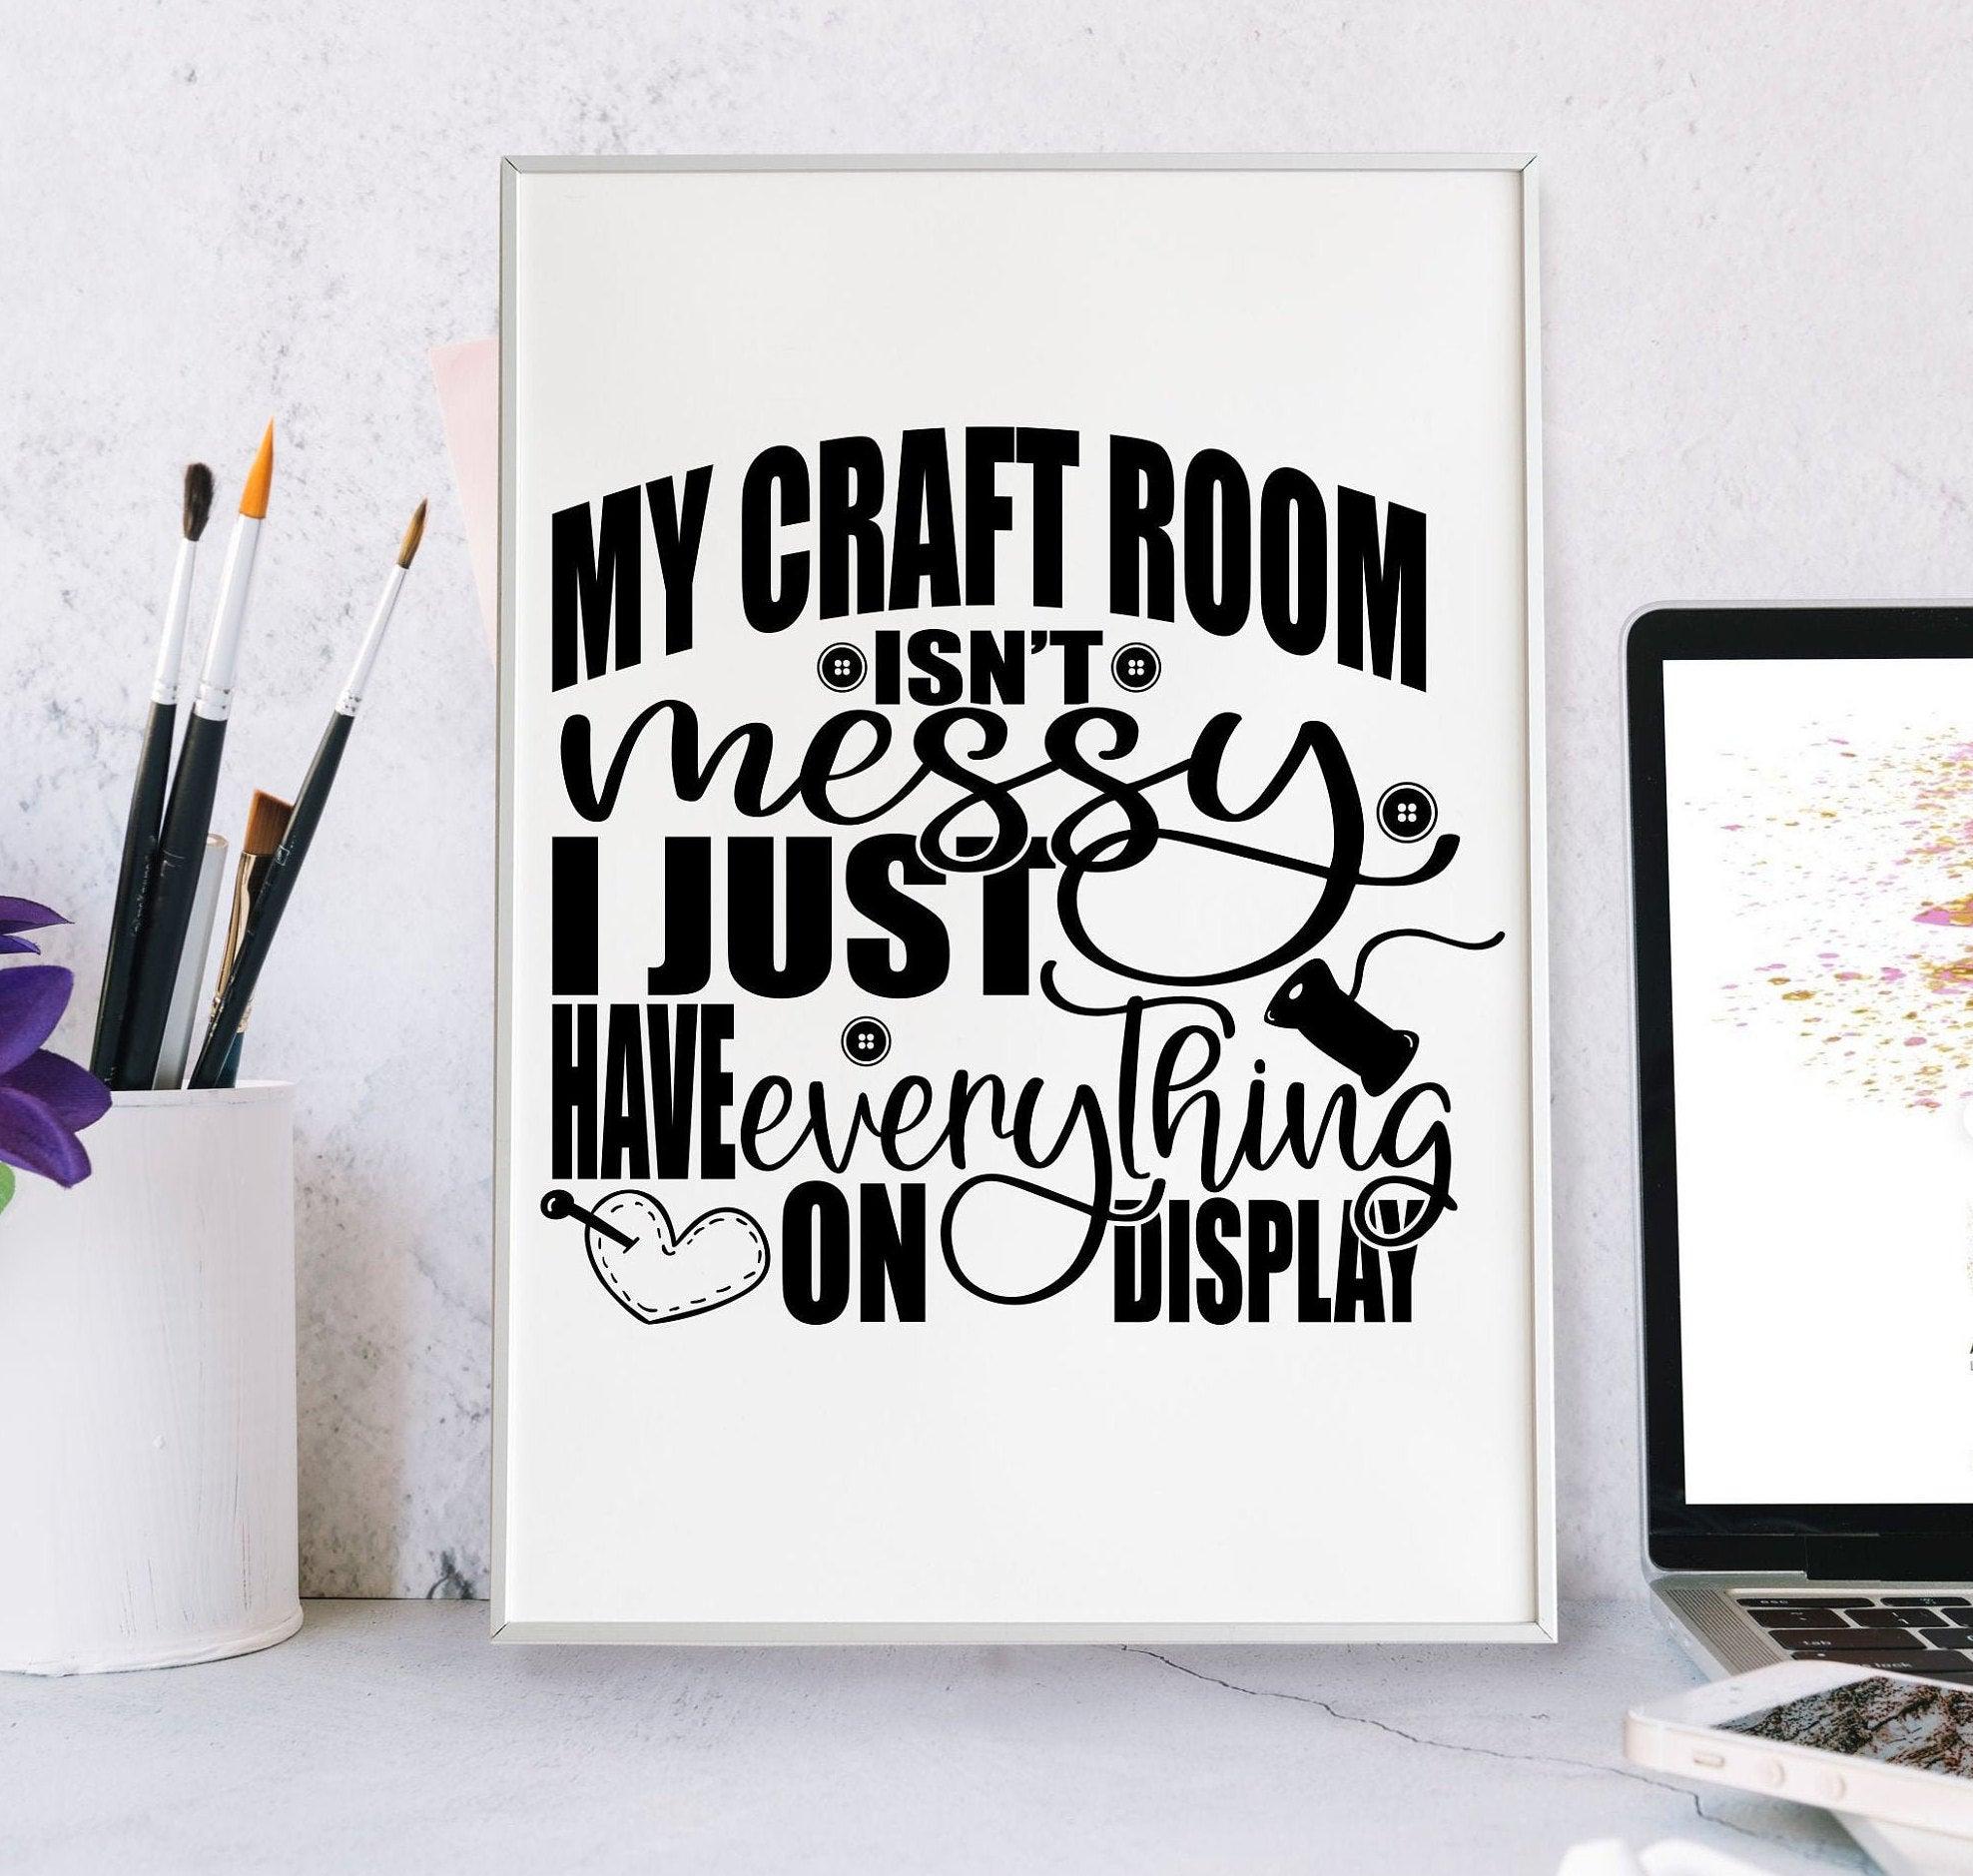 Craft-svg-crafting-room-svg-messy-crafts-svg-crafting-crafting-svgcraft-room-svgcrafty-sayingcraft-svg-designsvgcricutcrafters-svg-6051407d